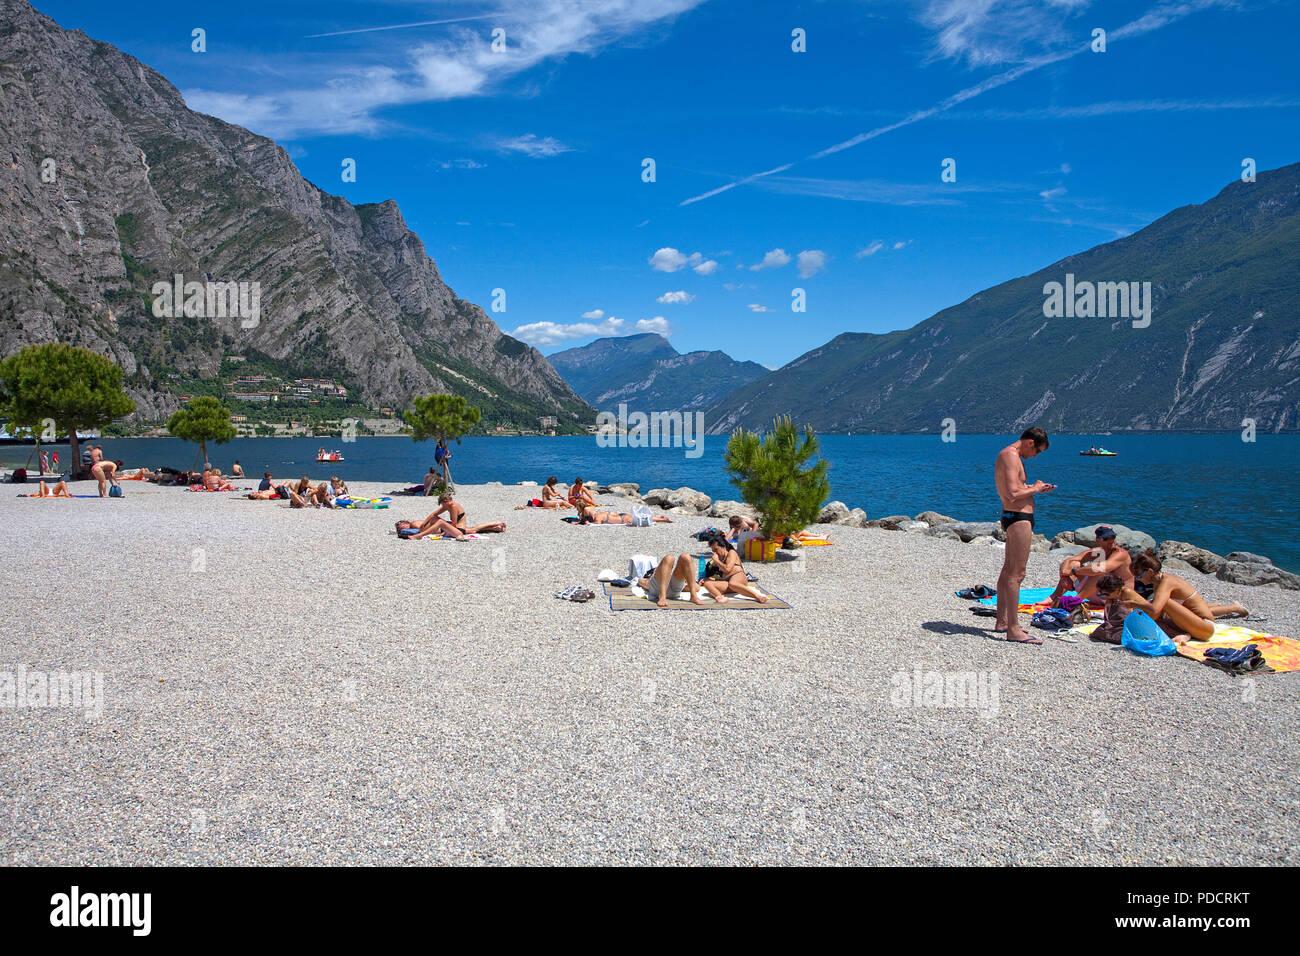 People at the beach of Limone, Limone sul Garda, Garda lake, Lombardy, Italy - Stock Image